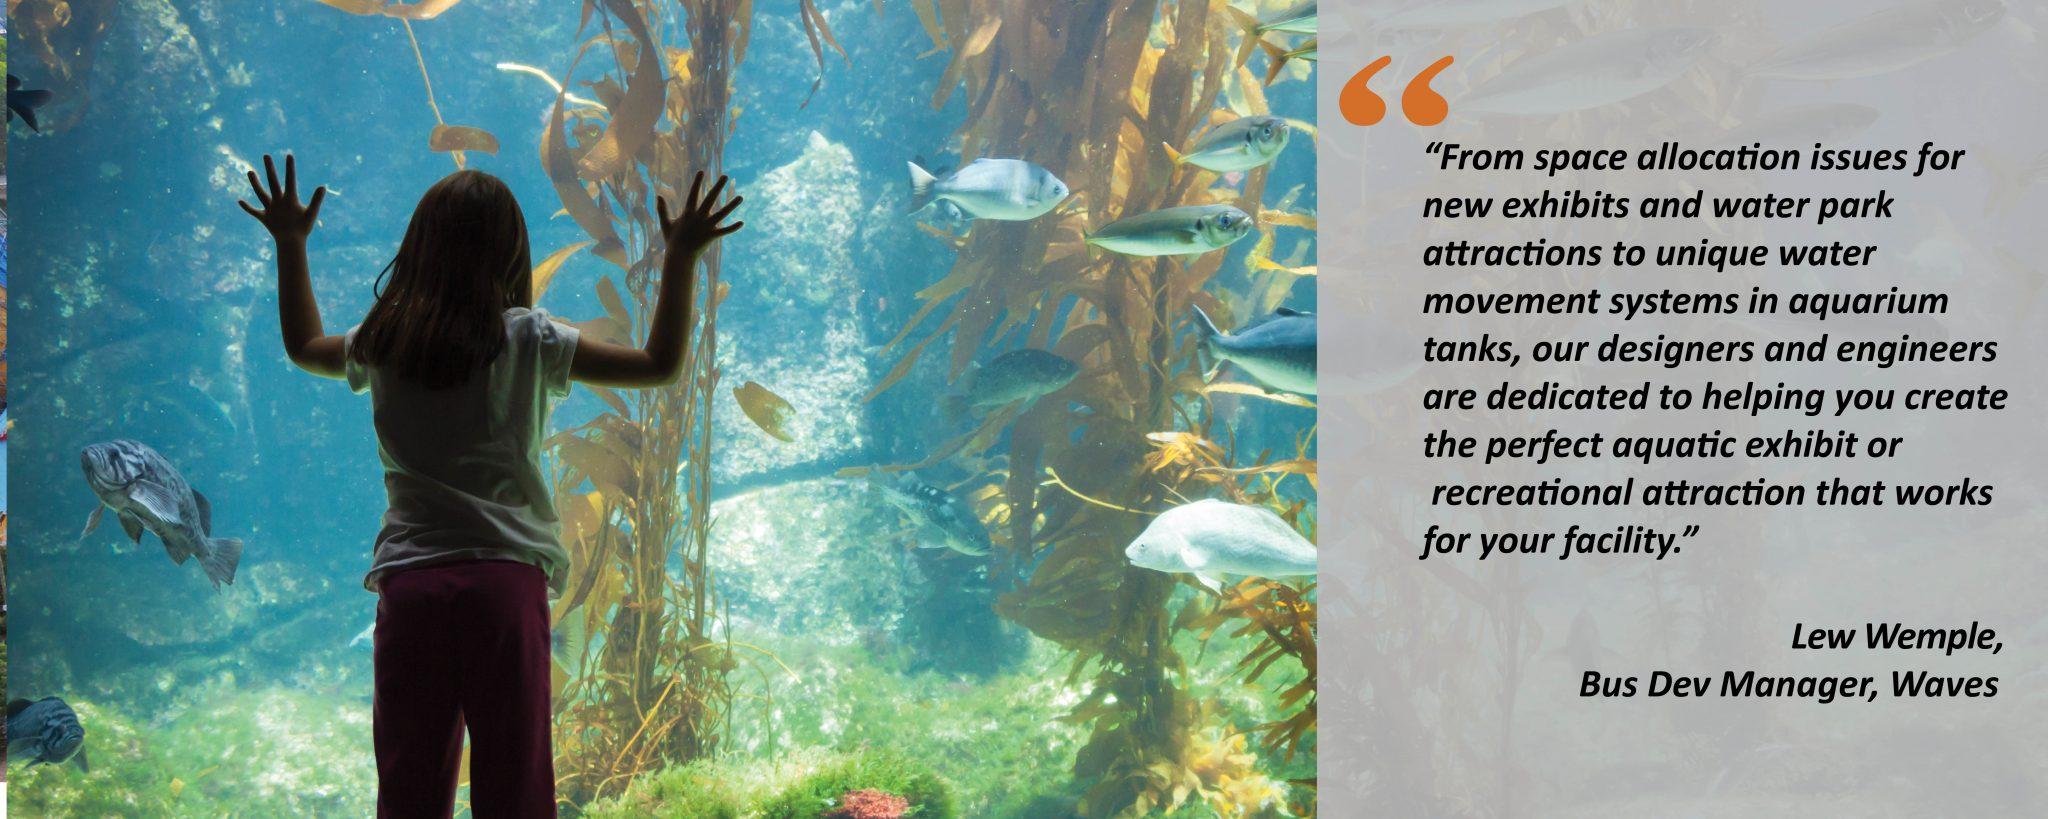 zoo and aquarium testimonial